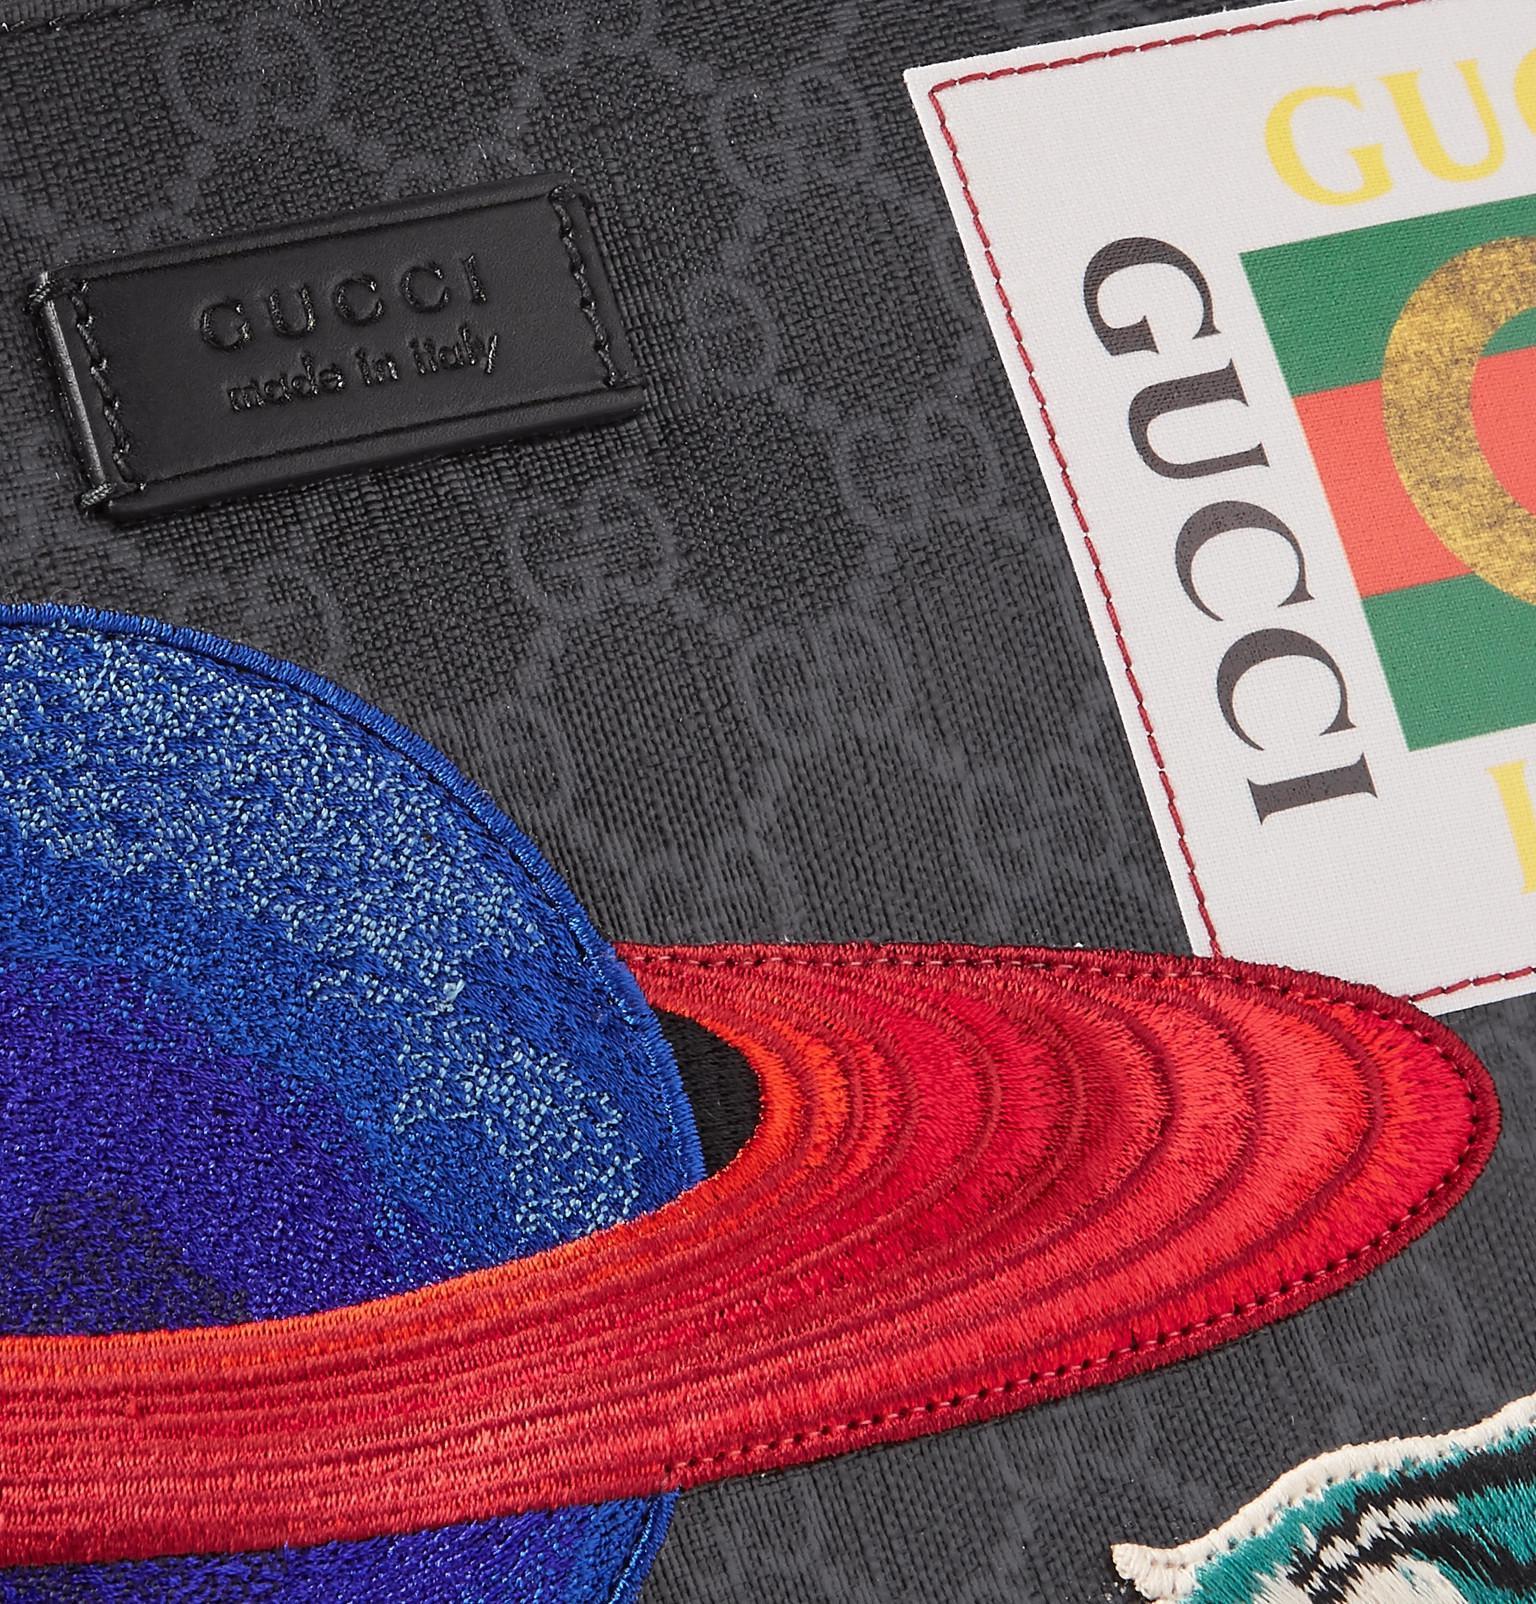 591d5e318a04b7 Gucci Courrier Leather-trimmed Appliquéd Monogrammed Coated-canvas ...